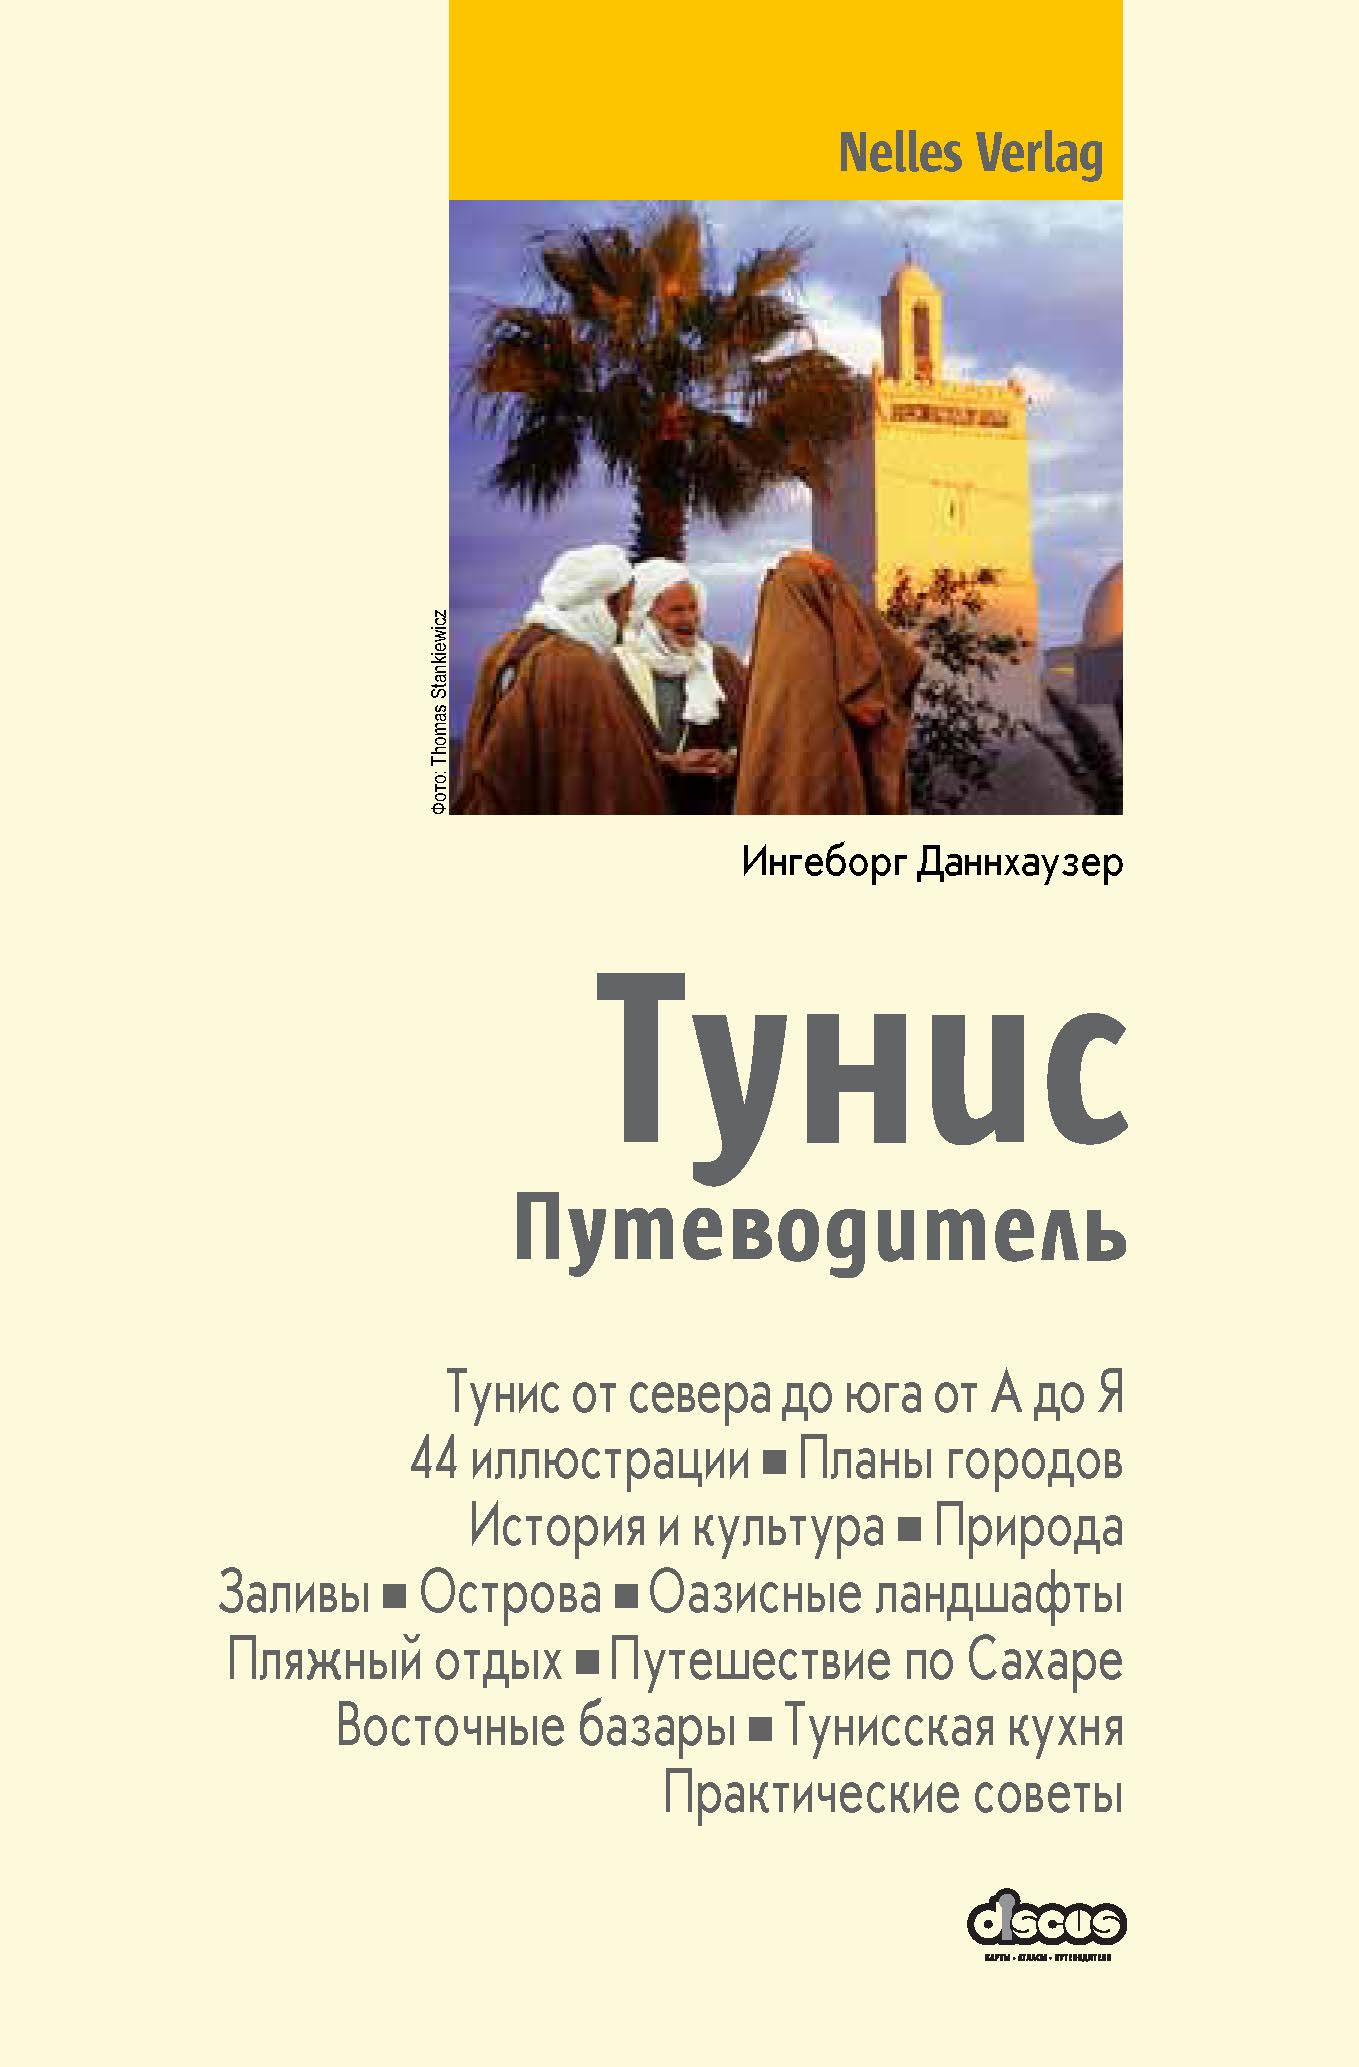 Ингеборг Даннхаузер Тунис. Путеводитель